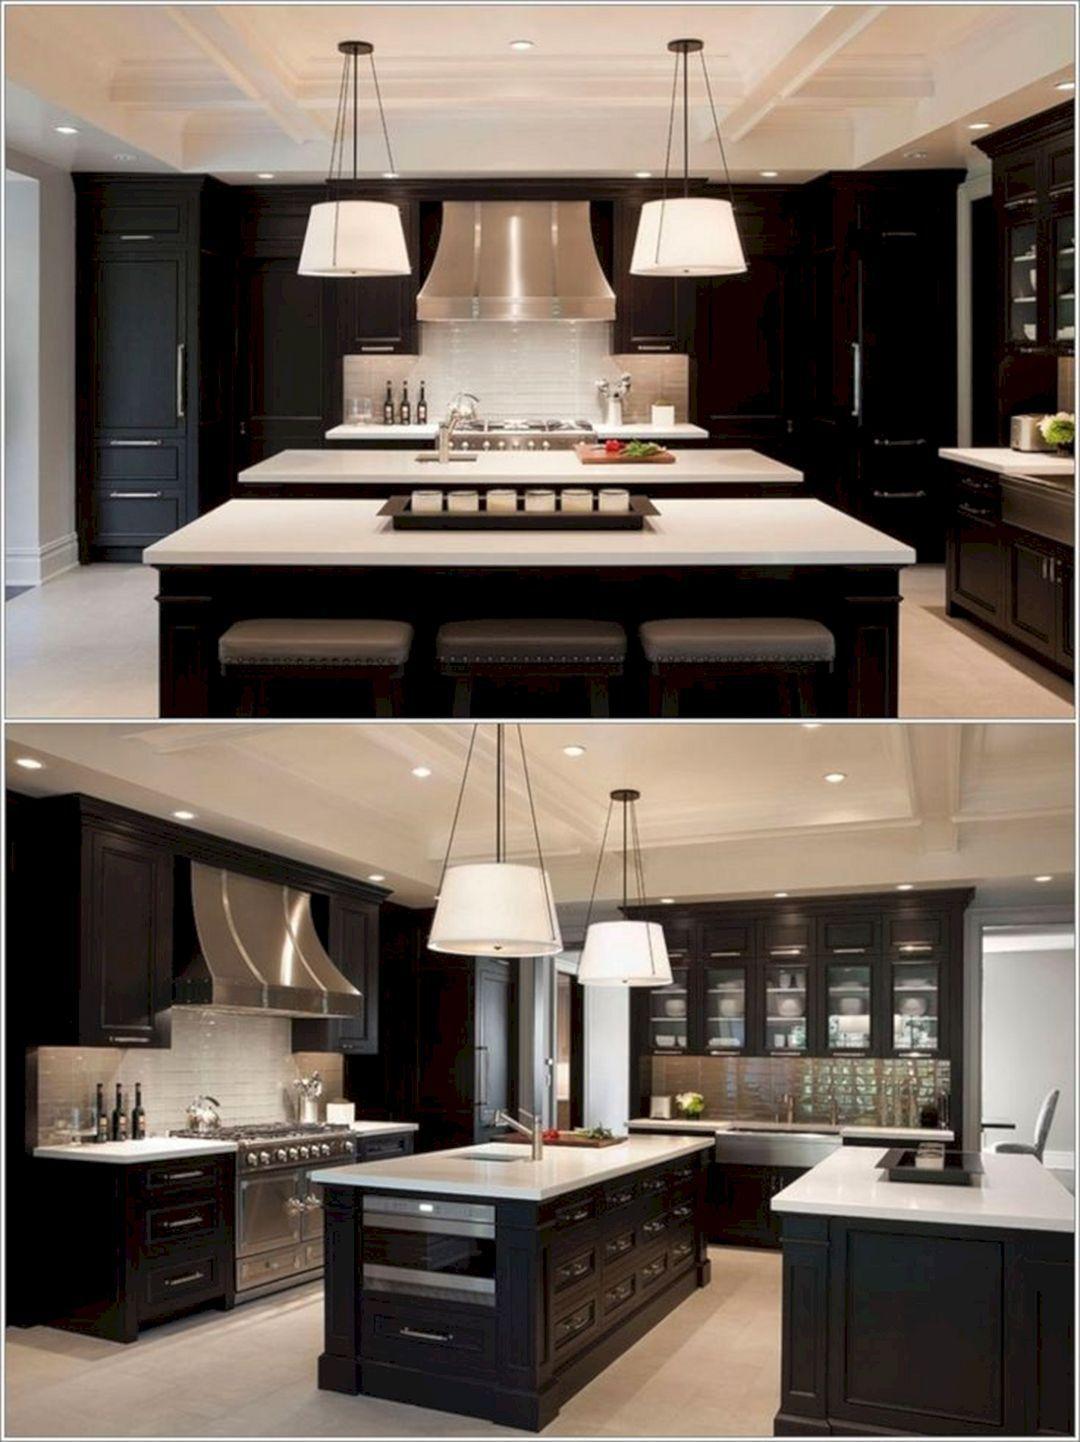 Pin By Allison St Martin On Cute Home Decor Interior Design Kitchen Home Kitchens Double Island Kitchen